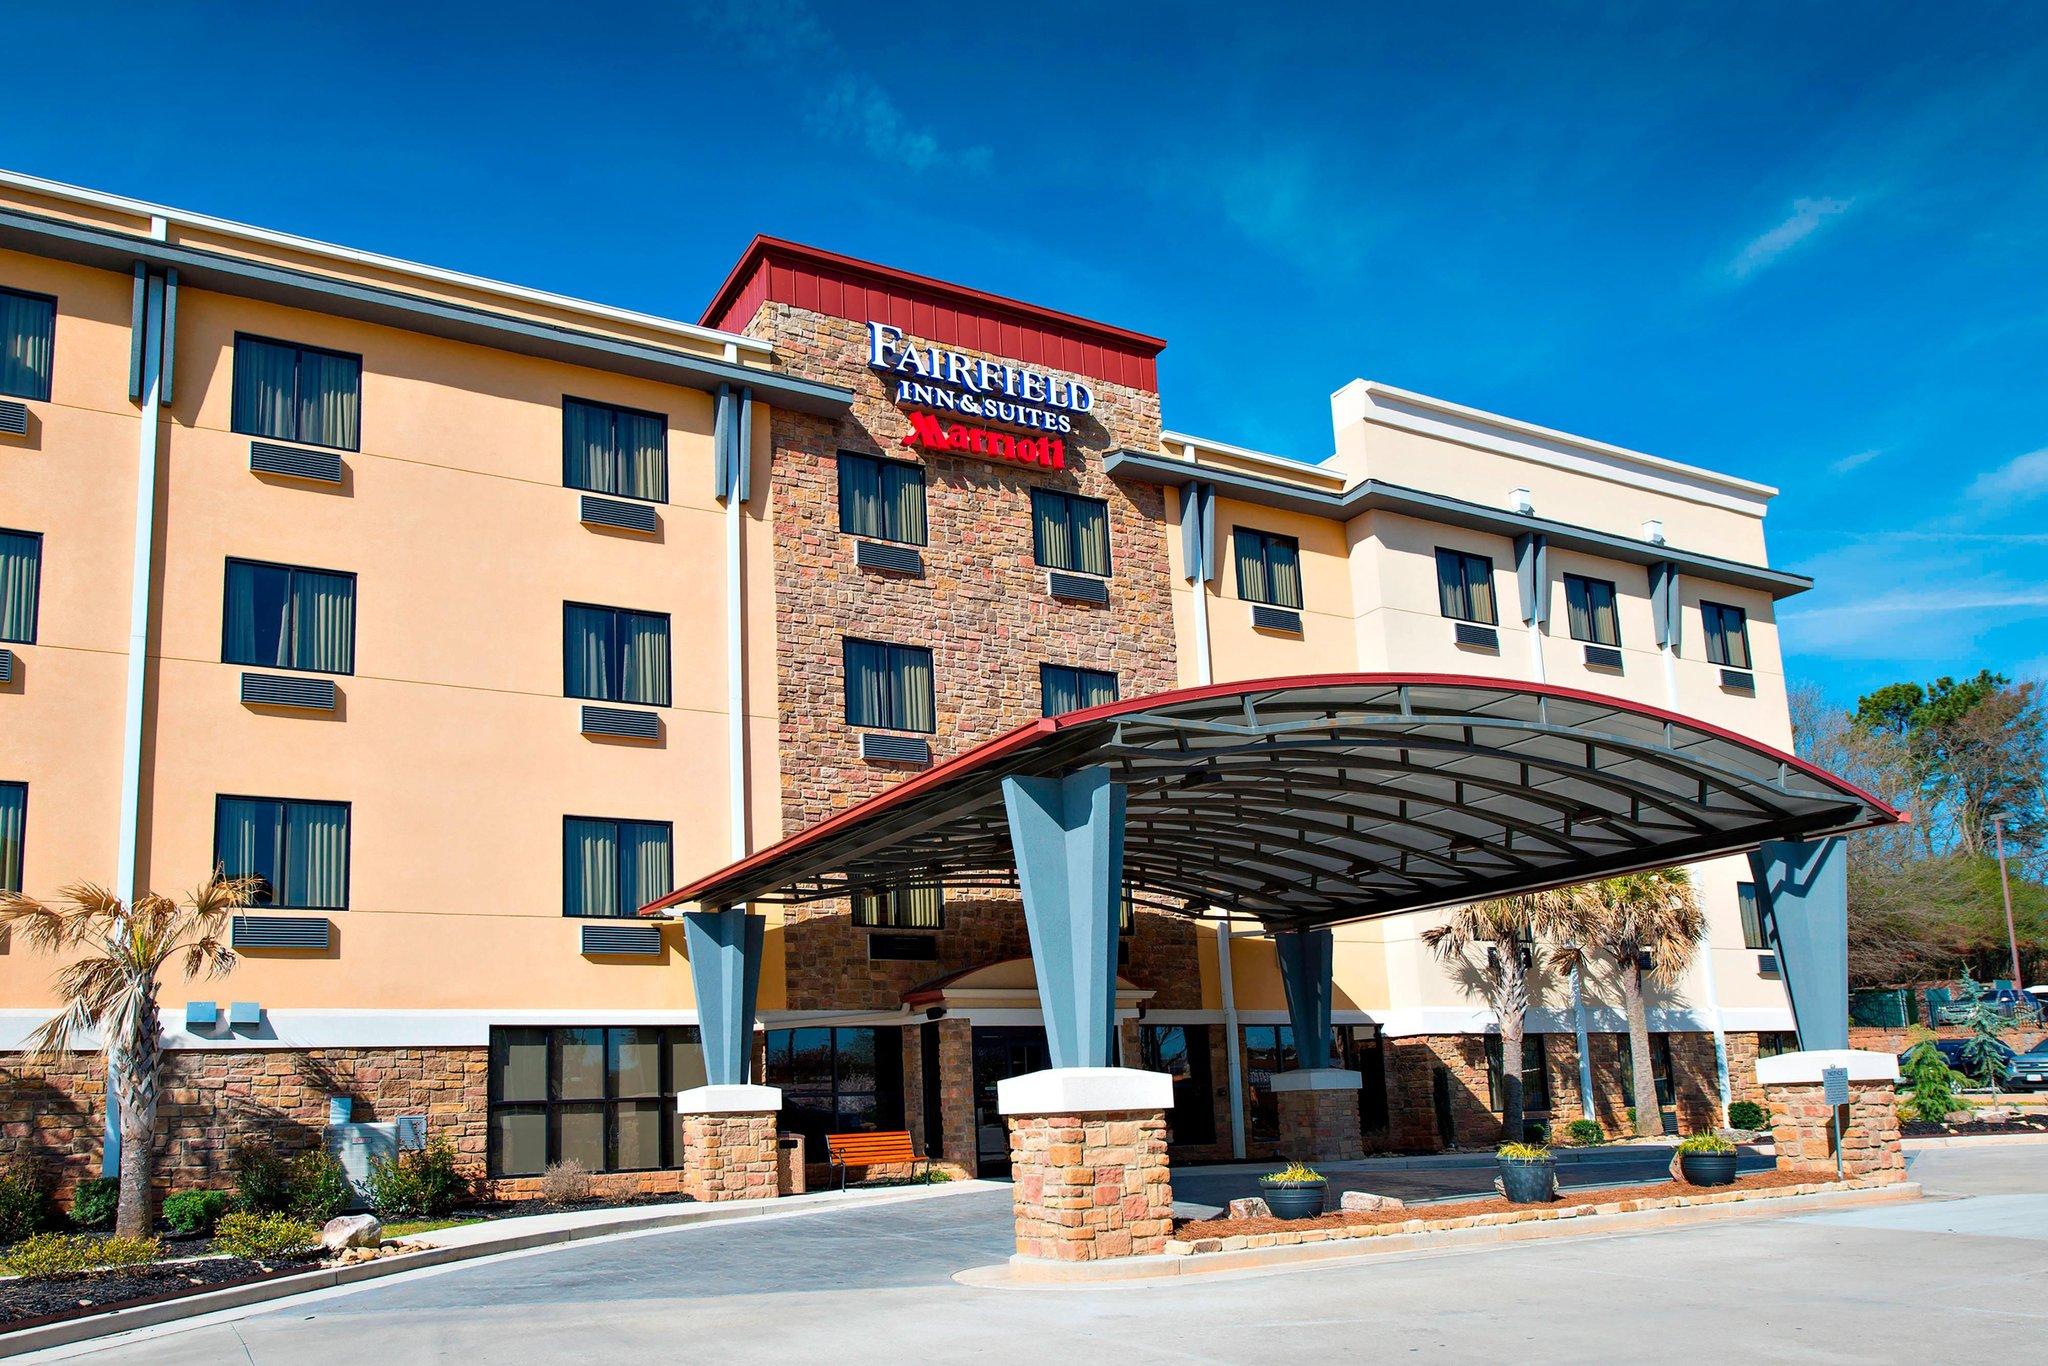 Fairfield Inn and Suites by Marriott Gainesville